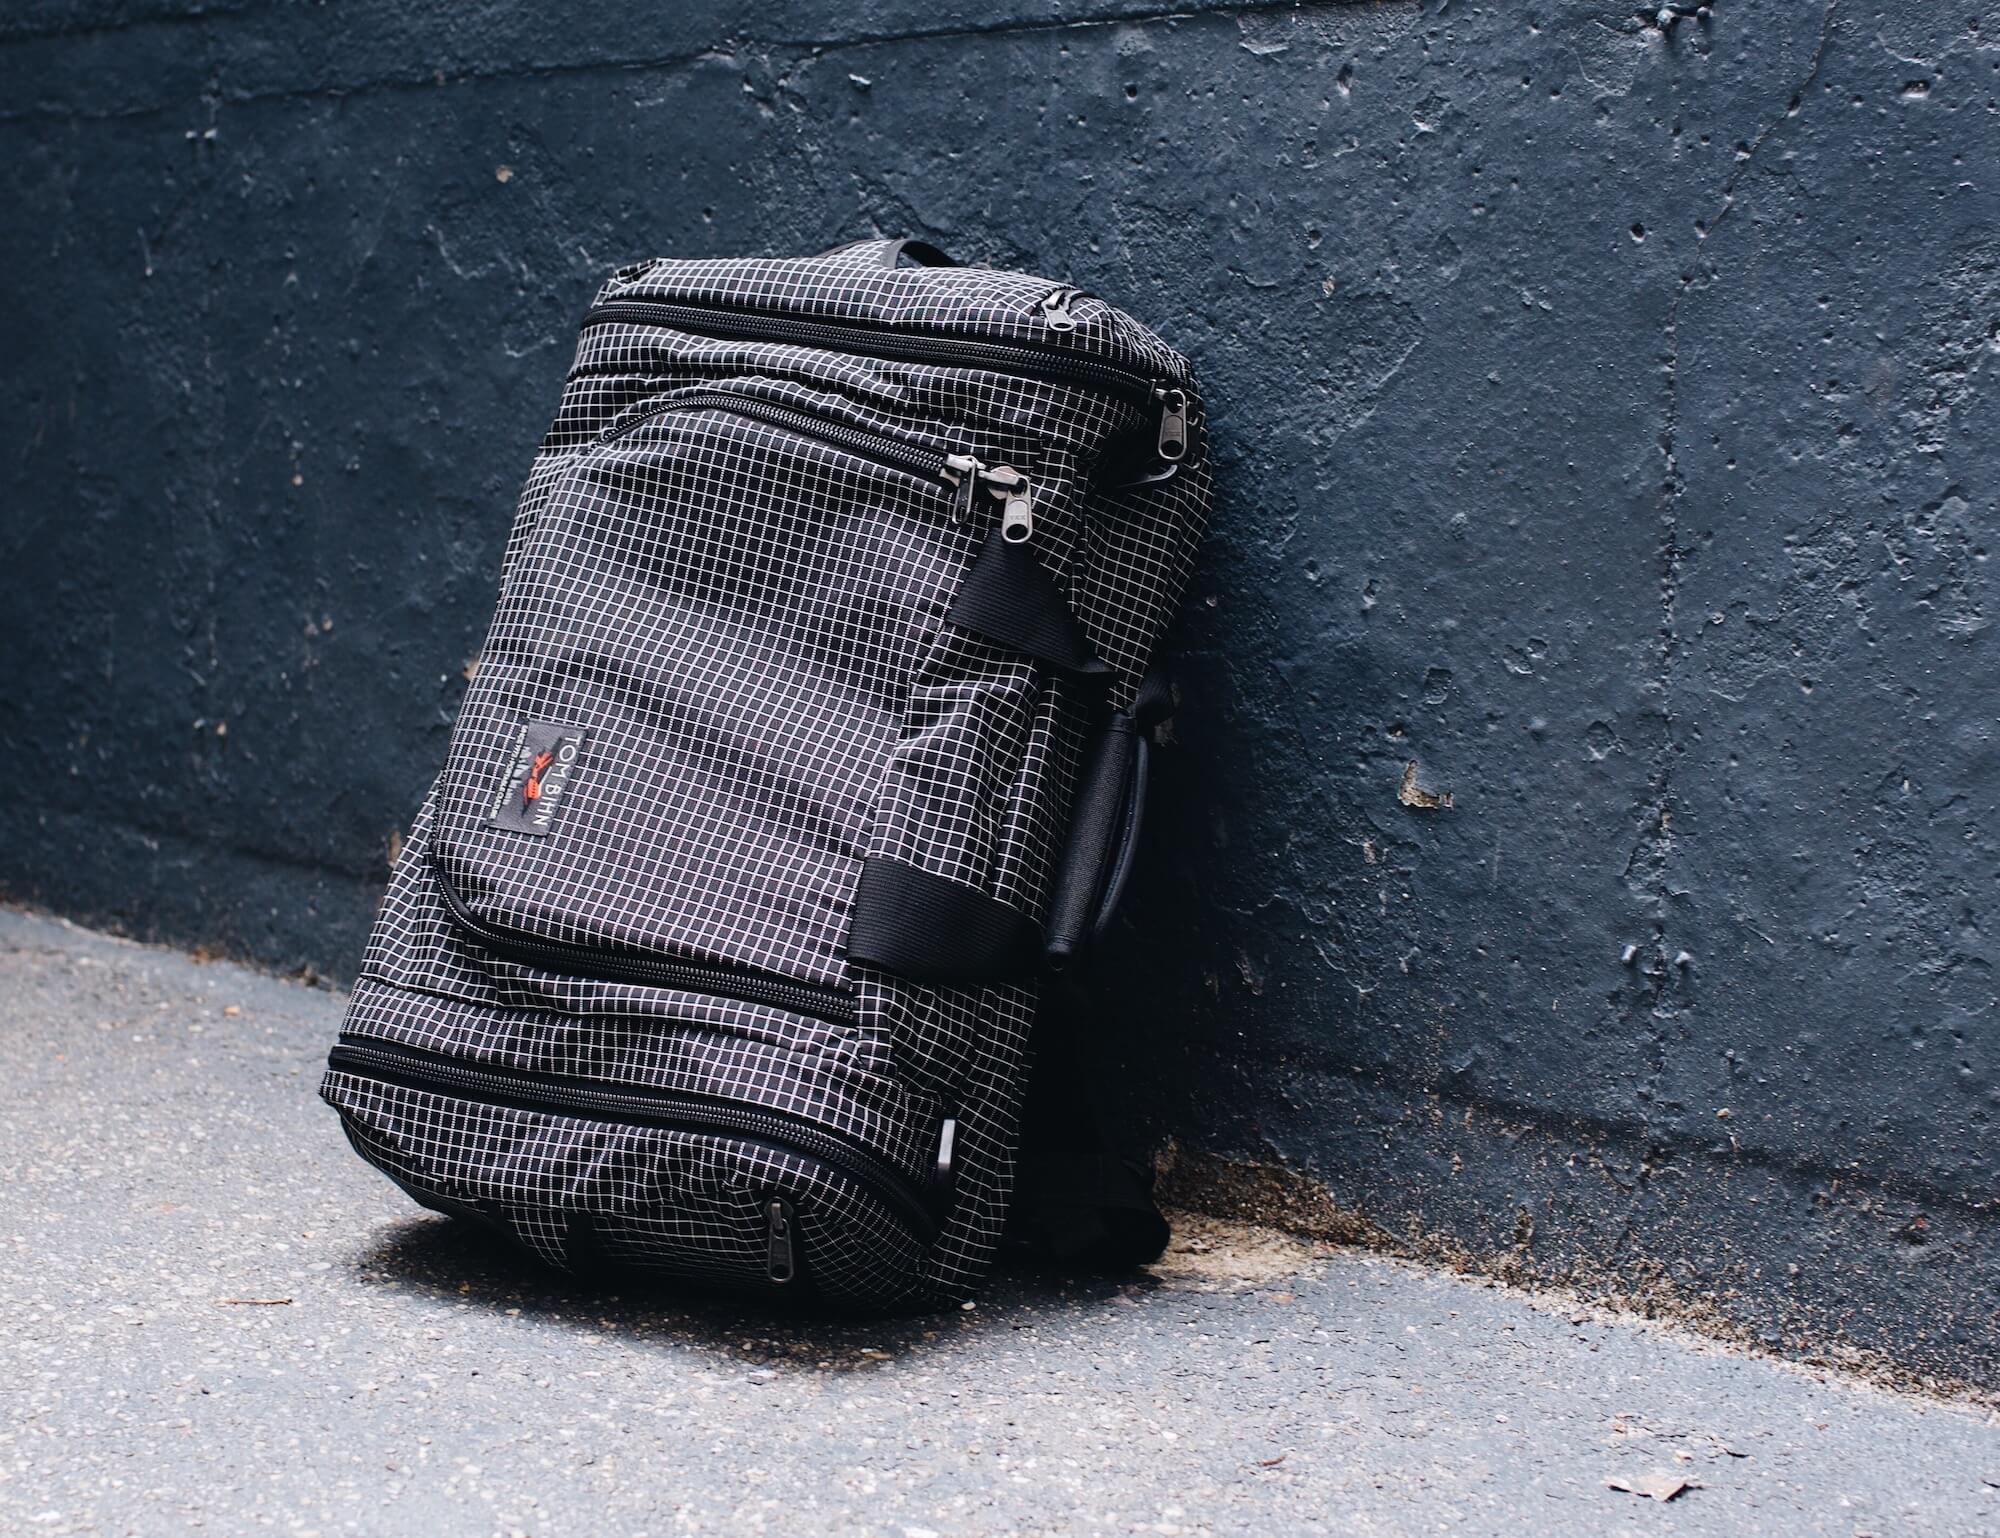 Tom Bihn Aeronaut 30 Backpack